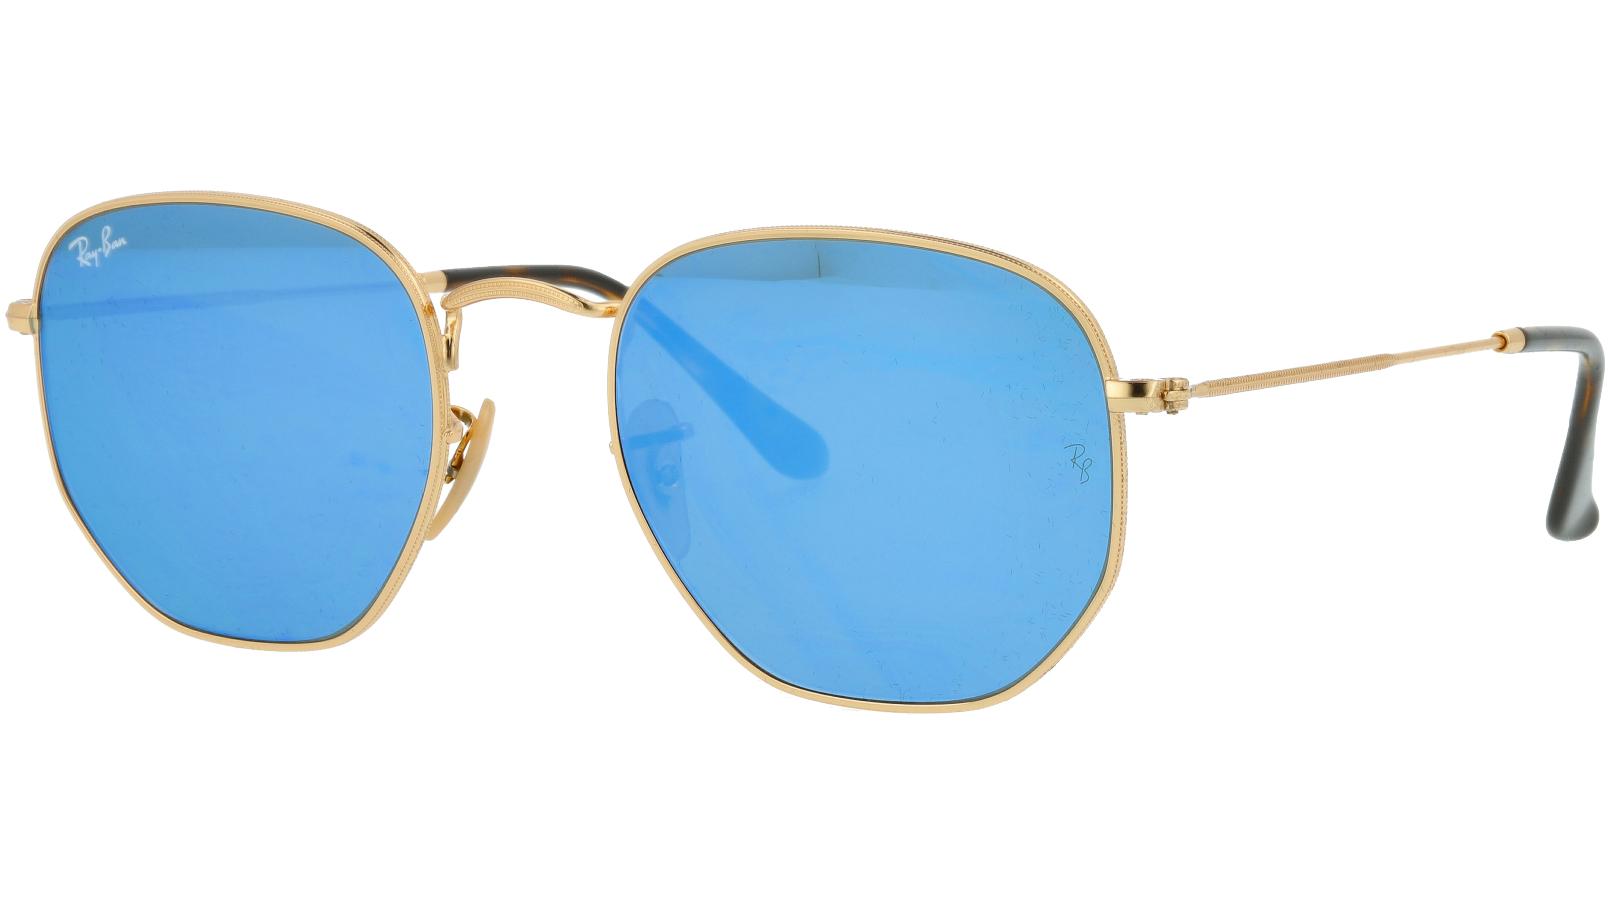 Ray-Ban RB3548N 001/9O Arista Hexagonal Sunglasses